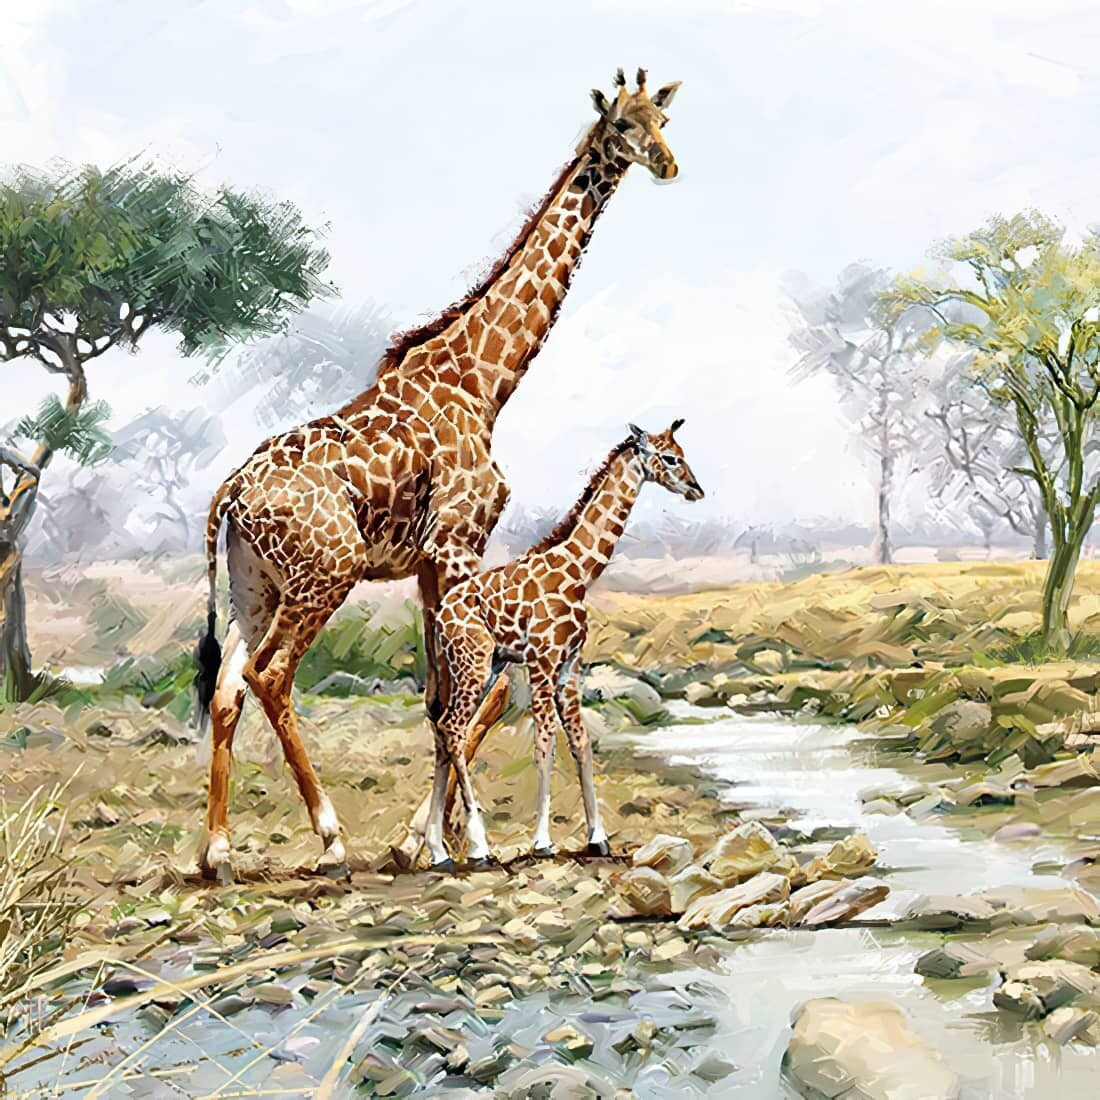 Decoupage Paper Napkins - Giraffes - 13x13 - (1 Sheet)